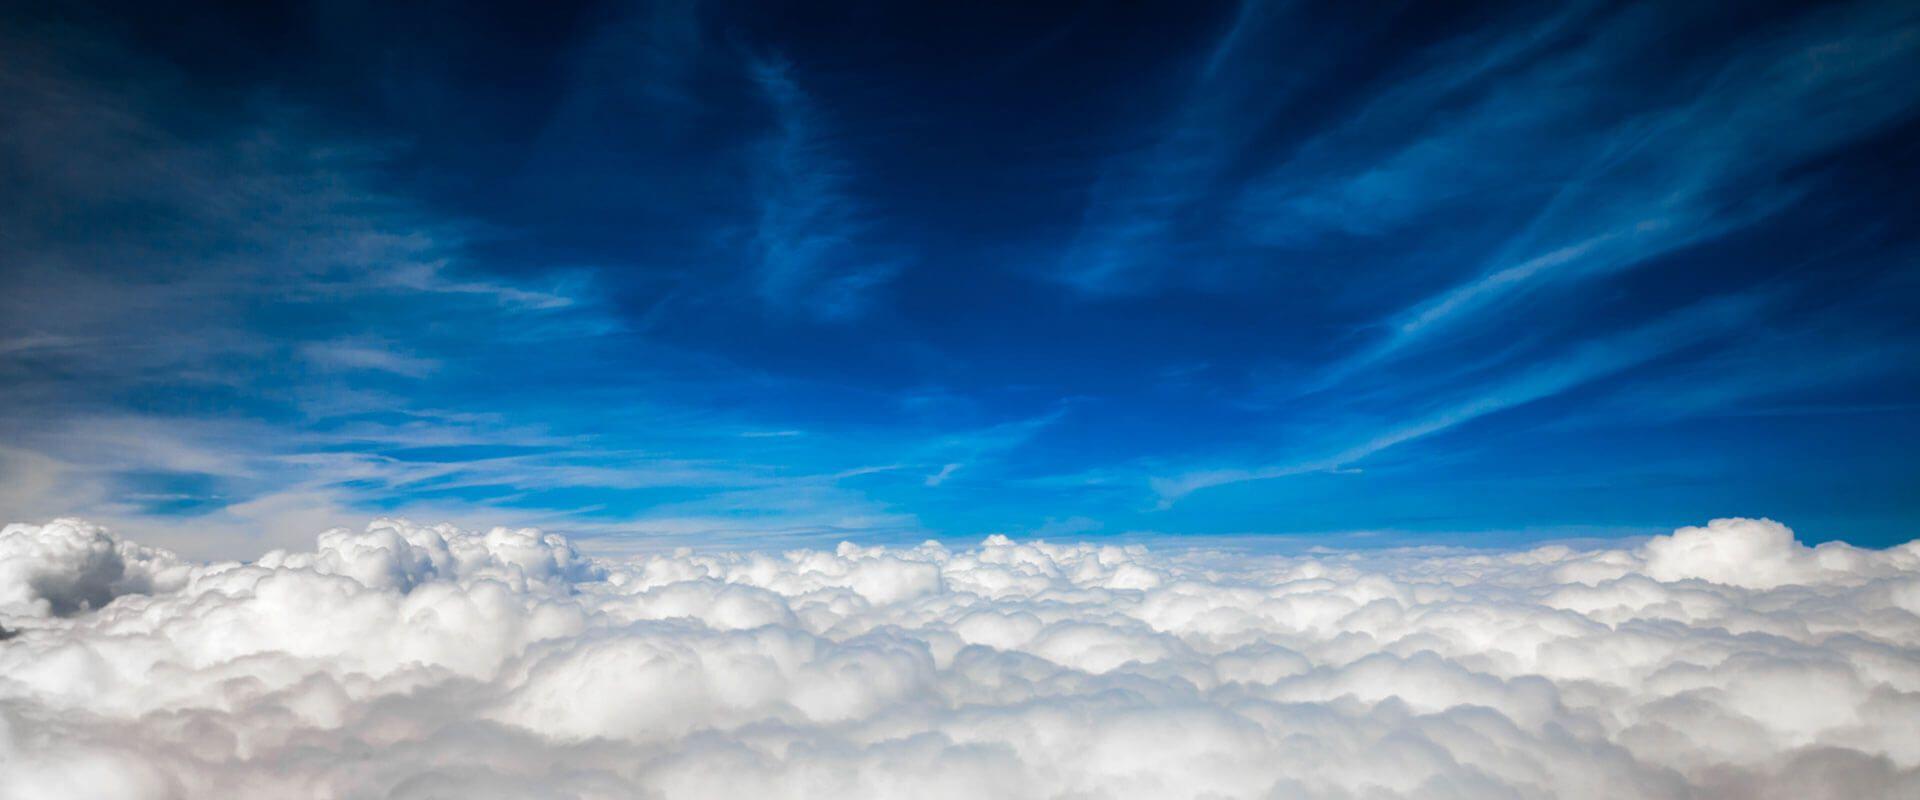 03-old-showcase_clouds.jpg - 85.47 kB